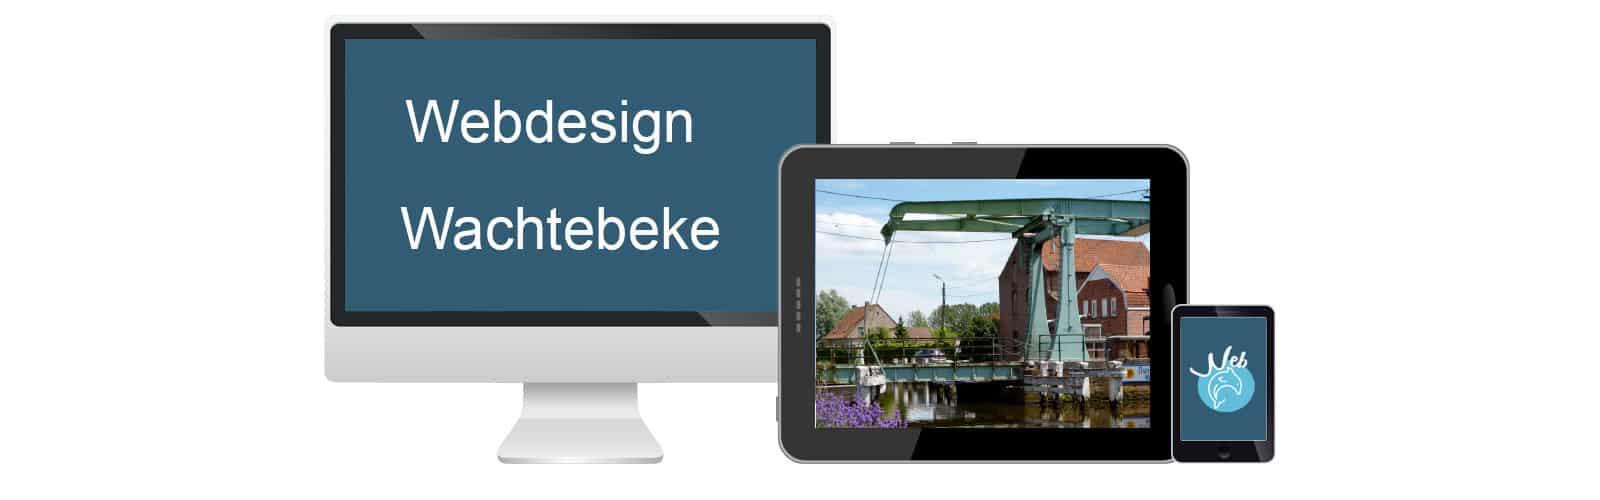 Webdesign Wachtebeke - webdolfijn